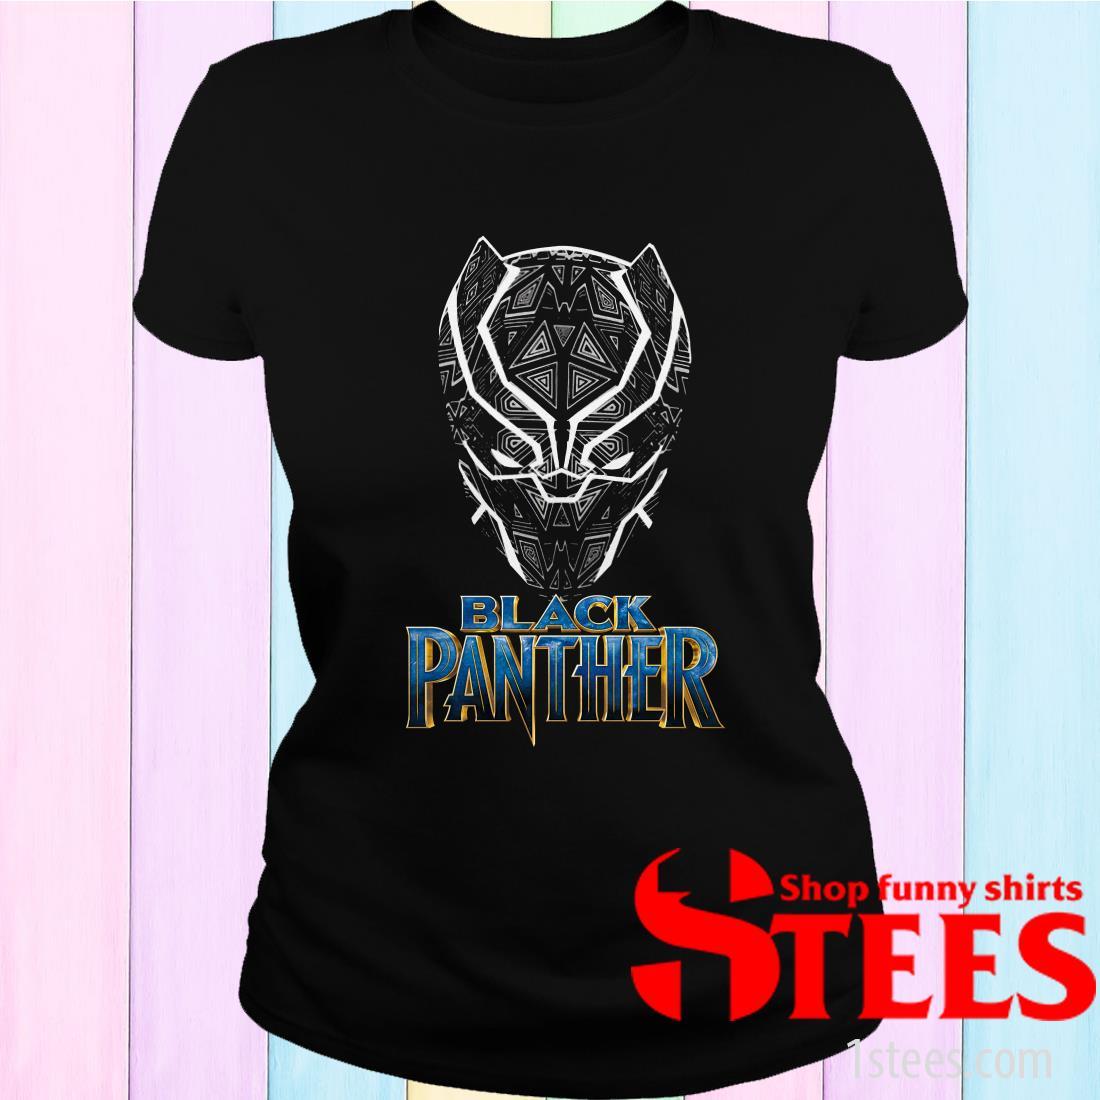 Black Panther King Chadwick Boseman 1977 2020 Women's T-Shirt